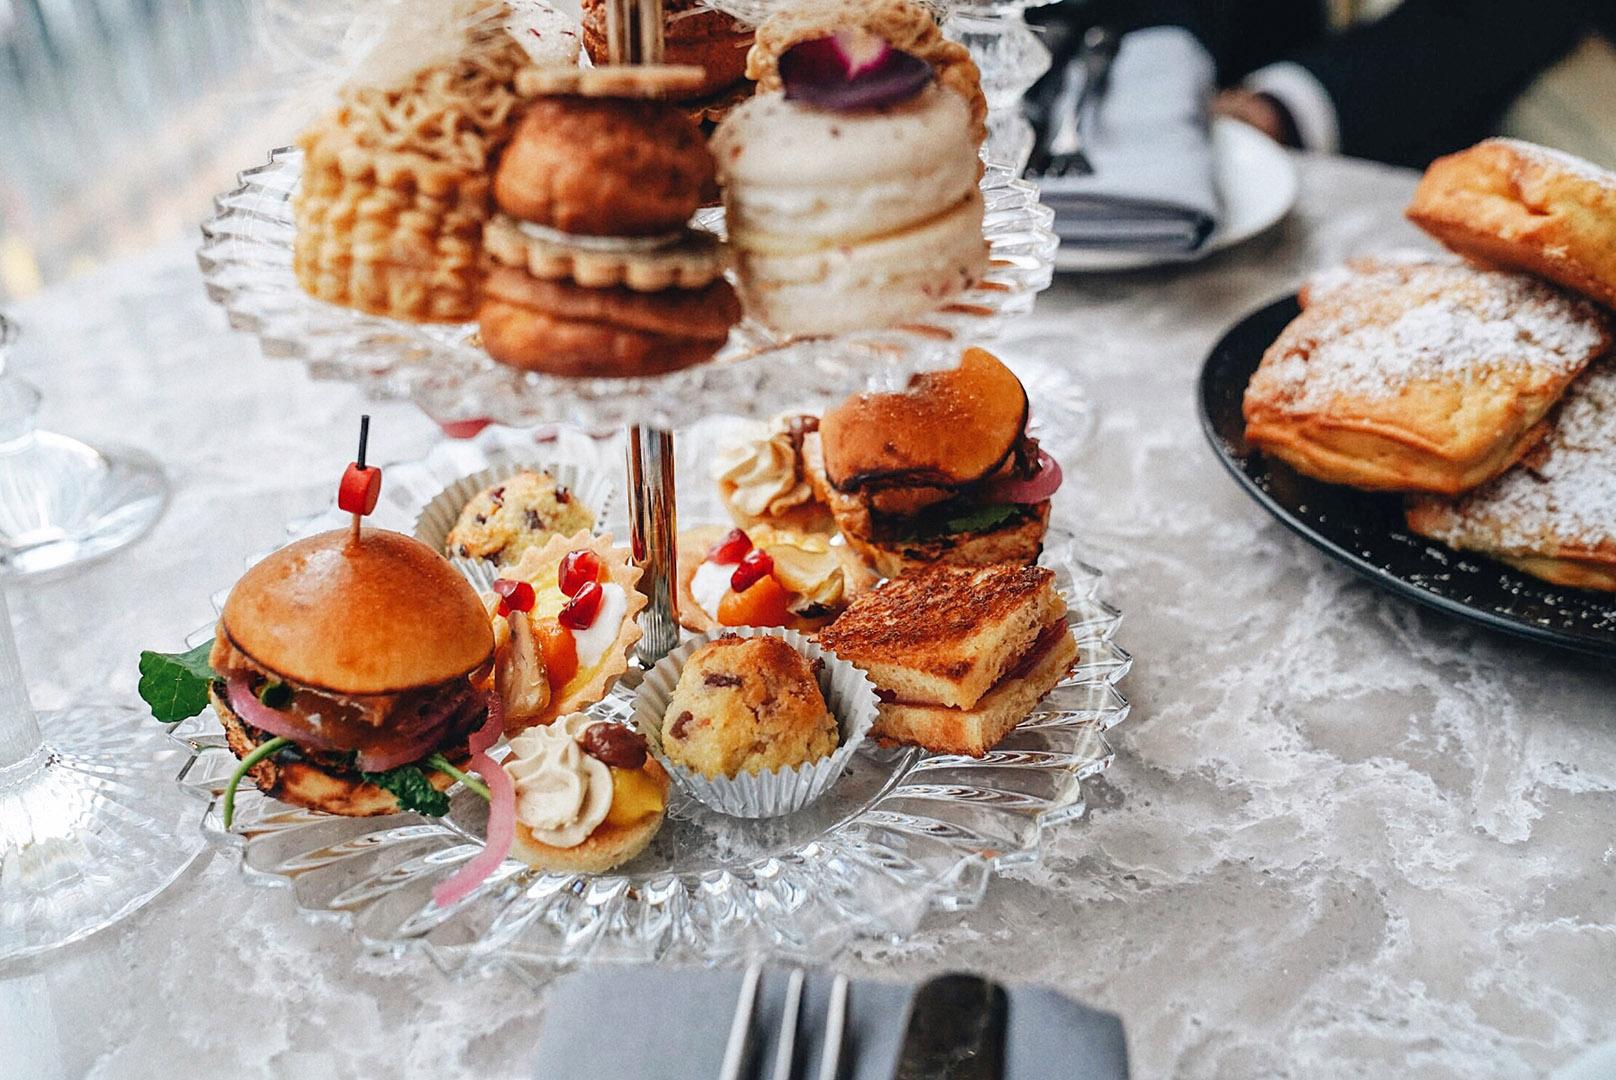 Start from the bottom with SAVORIES;  Croque Monsieur Gruyere Holiday Stuffing, Apple, Walnut Butternut Squash Tart, Chestnut, Pomegranate Foie Gras, Almond Financier, Fig Roasted Turkey, Pain de Mie, Plum Jam.